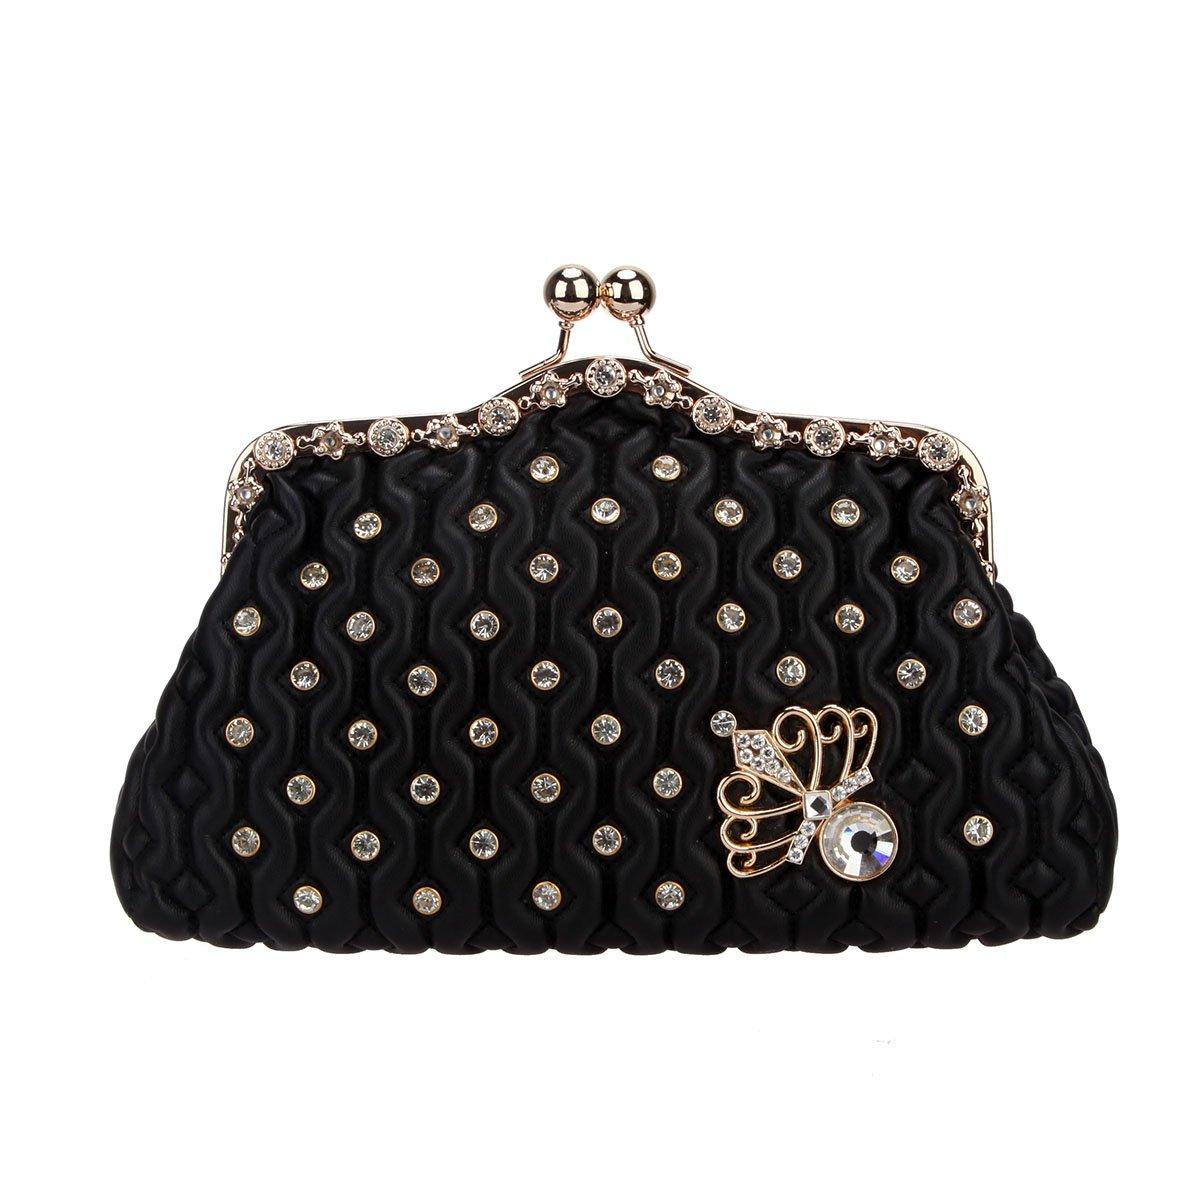 Fawziya Kiss Lock Crystal Butterfly Purses And Handbags For Women Mini Bag-Black